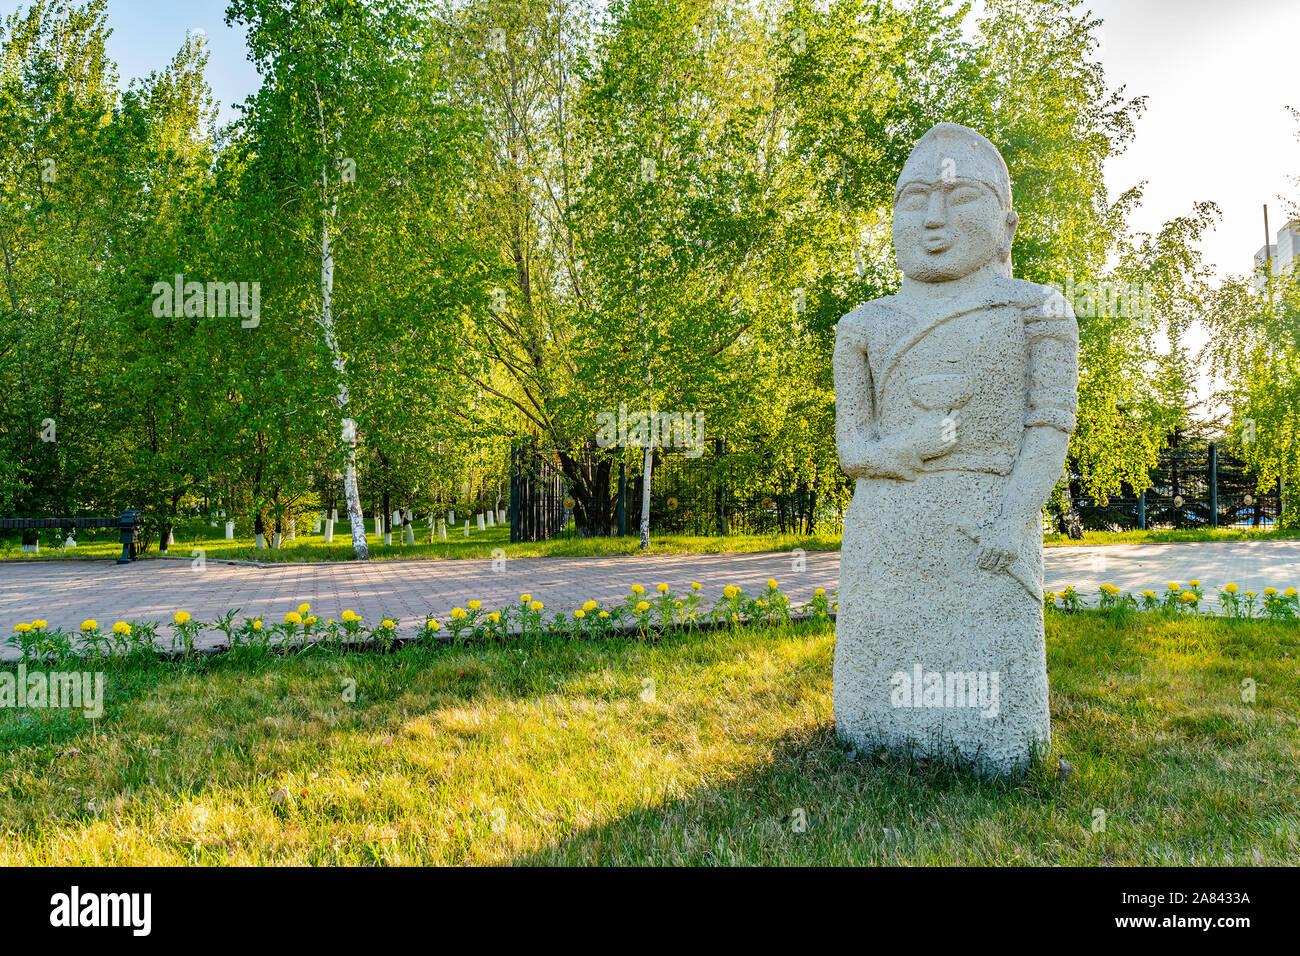 Nur-Sultan Astana Central City Tsentralnyy Gorodskoy Park View of a Balbal Sculpture on a Sunny Blue Sky Day Stock Photo